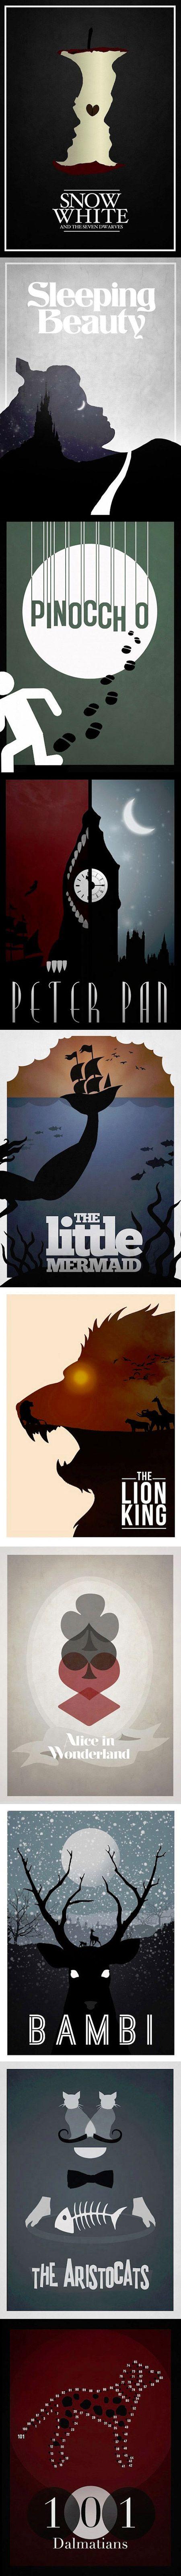 Disney Films (minimalist posters) | Snow White, Sleeping  Beauty, Pinnochio, Peter Pan, The Littler Mermaid, The Lion King, Alice in Wonderland, Bambi, The Aristocrats, & 101 Dalmatians